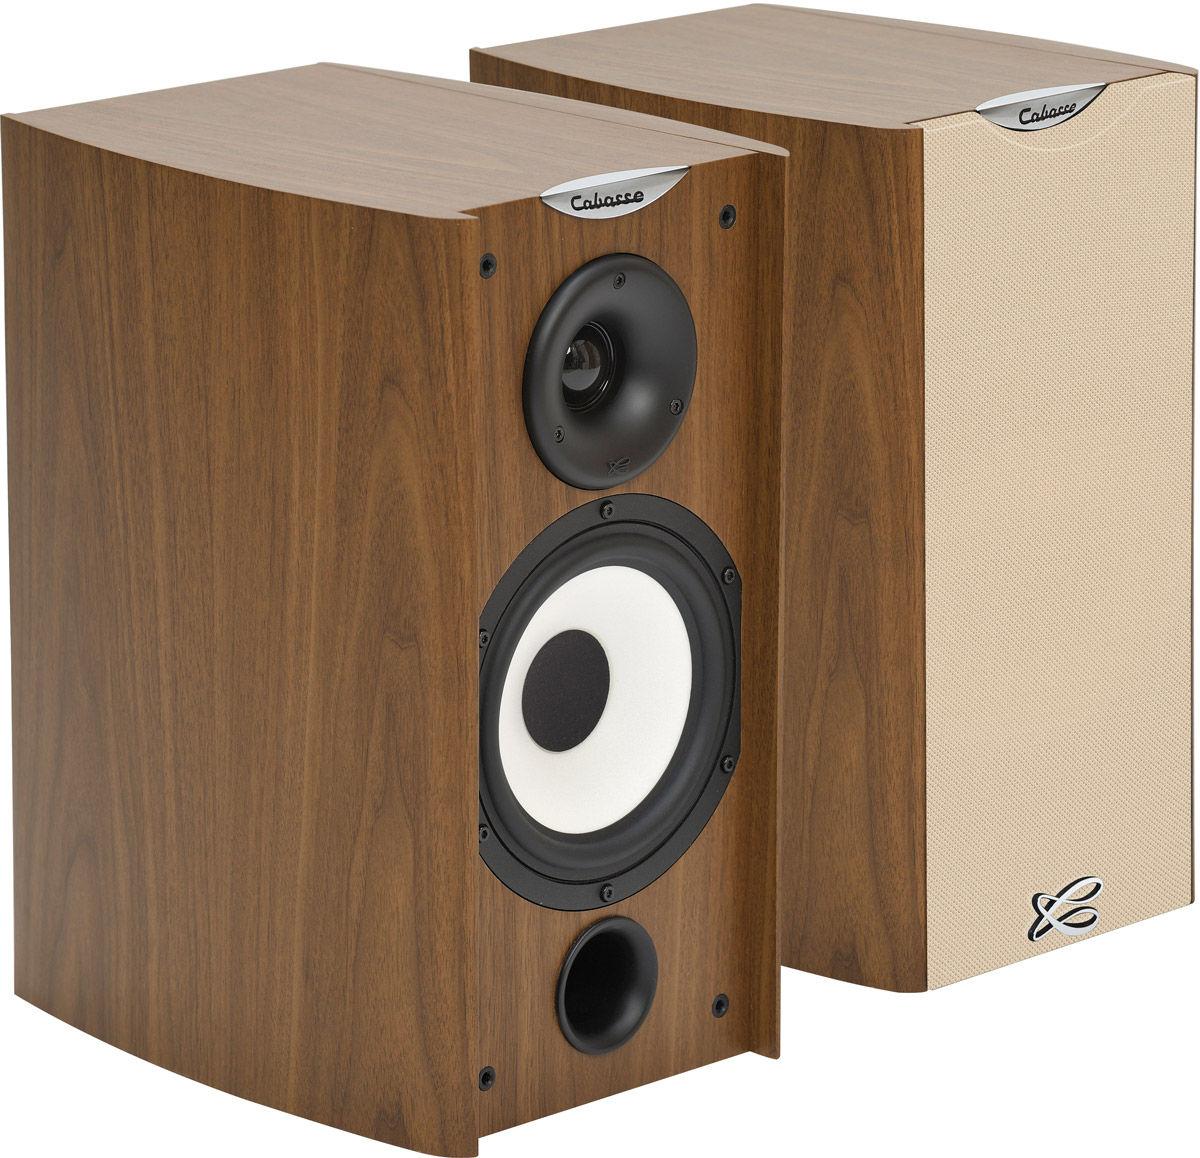 cabasse mt4 samoa enceintes compactes son vid. Black Bedroom Furniture Sets. Home Design Ideas